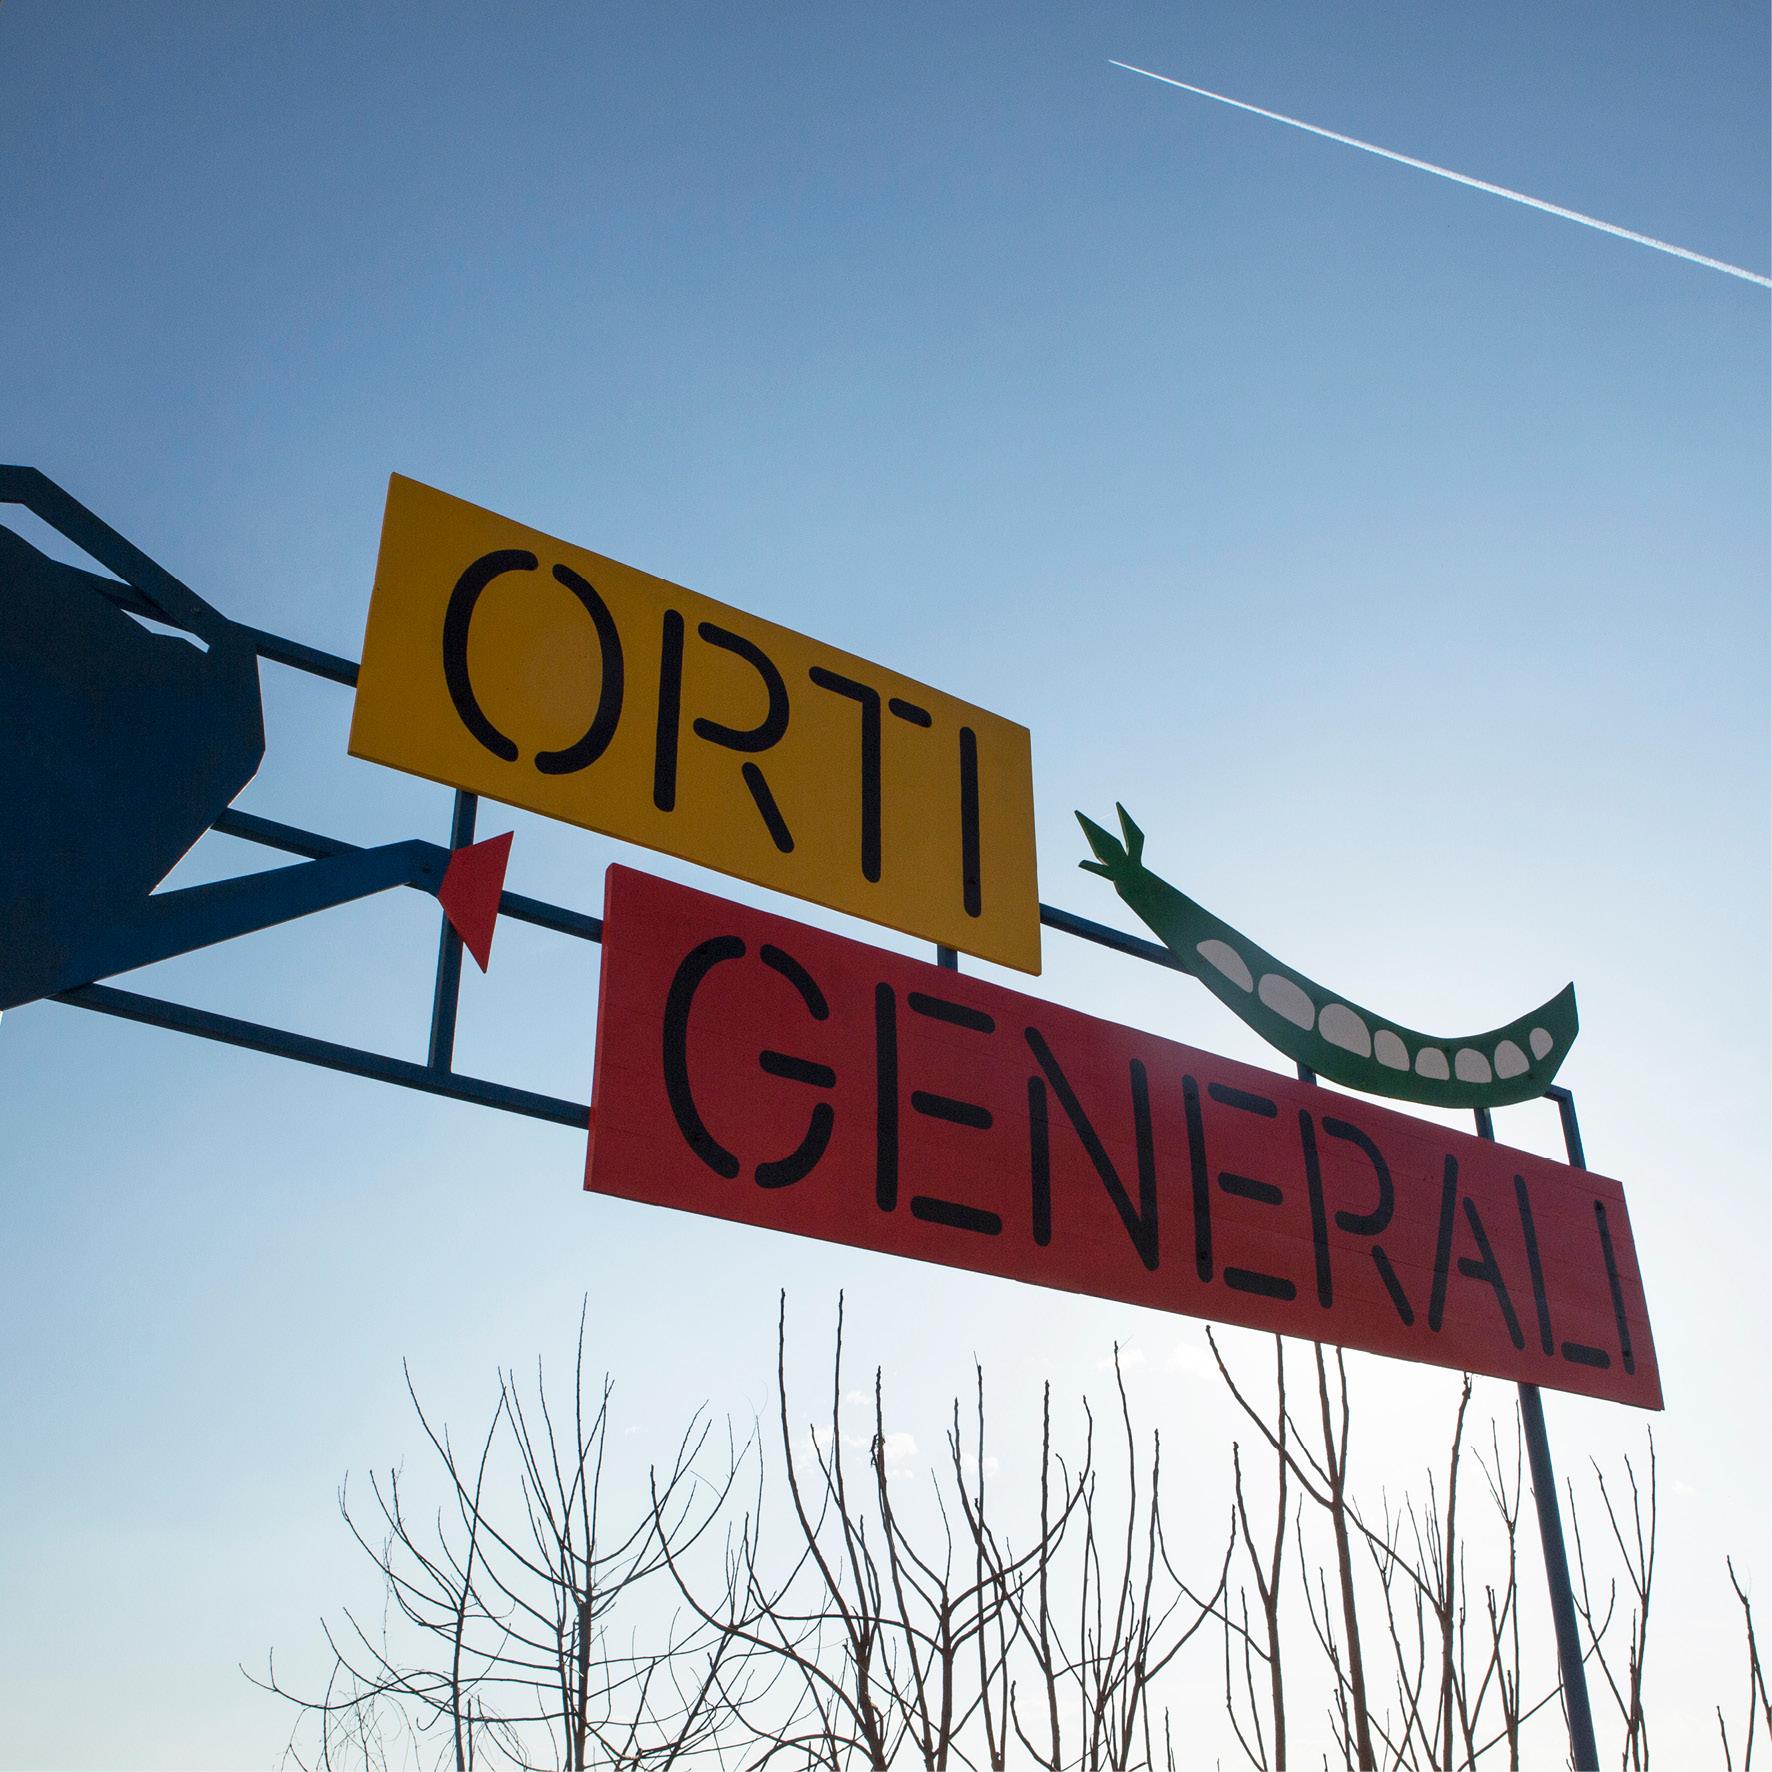 OHT_Orti Generali_